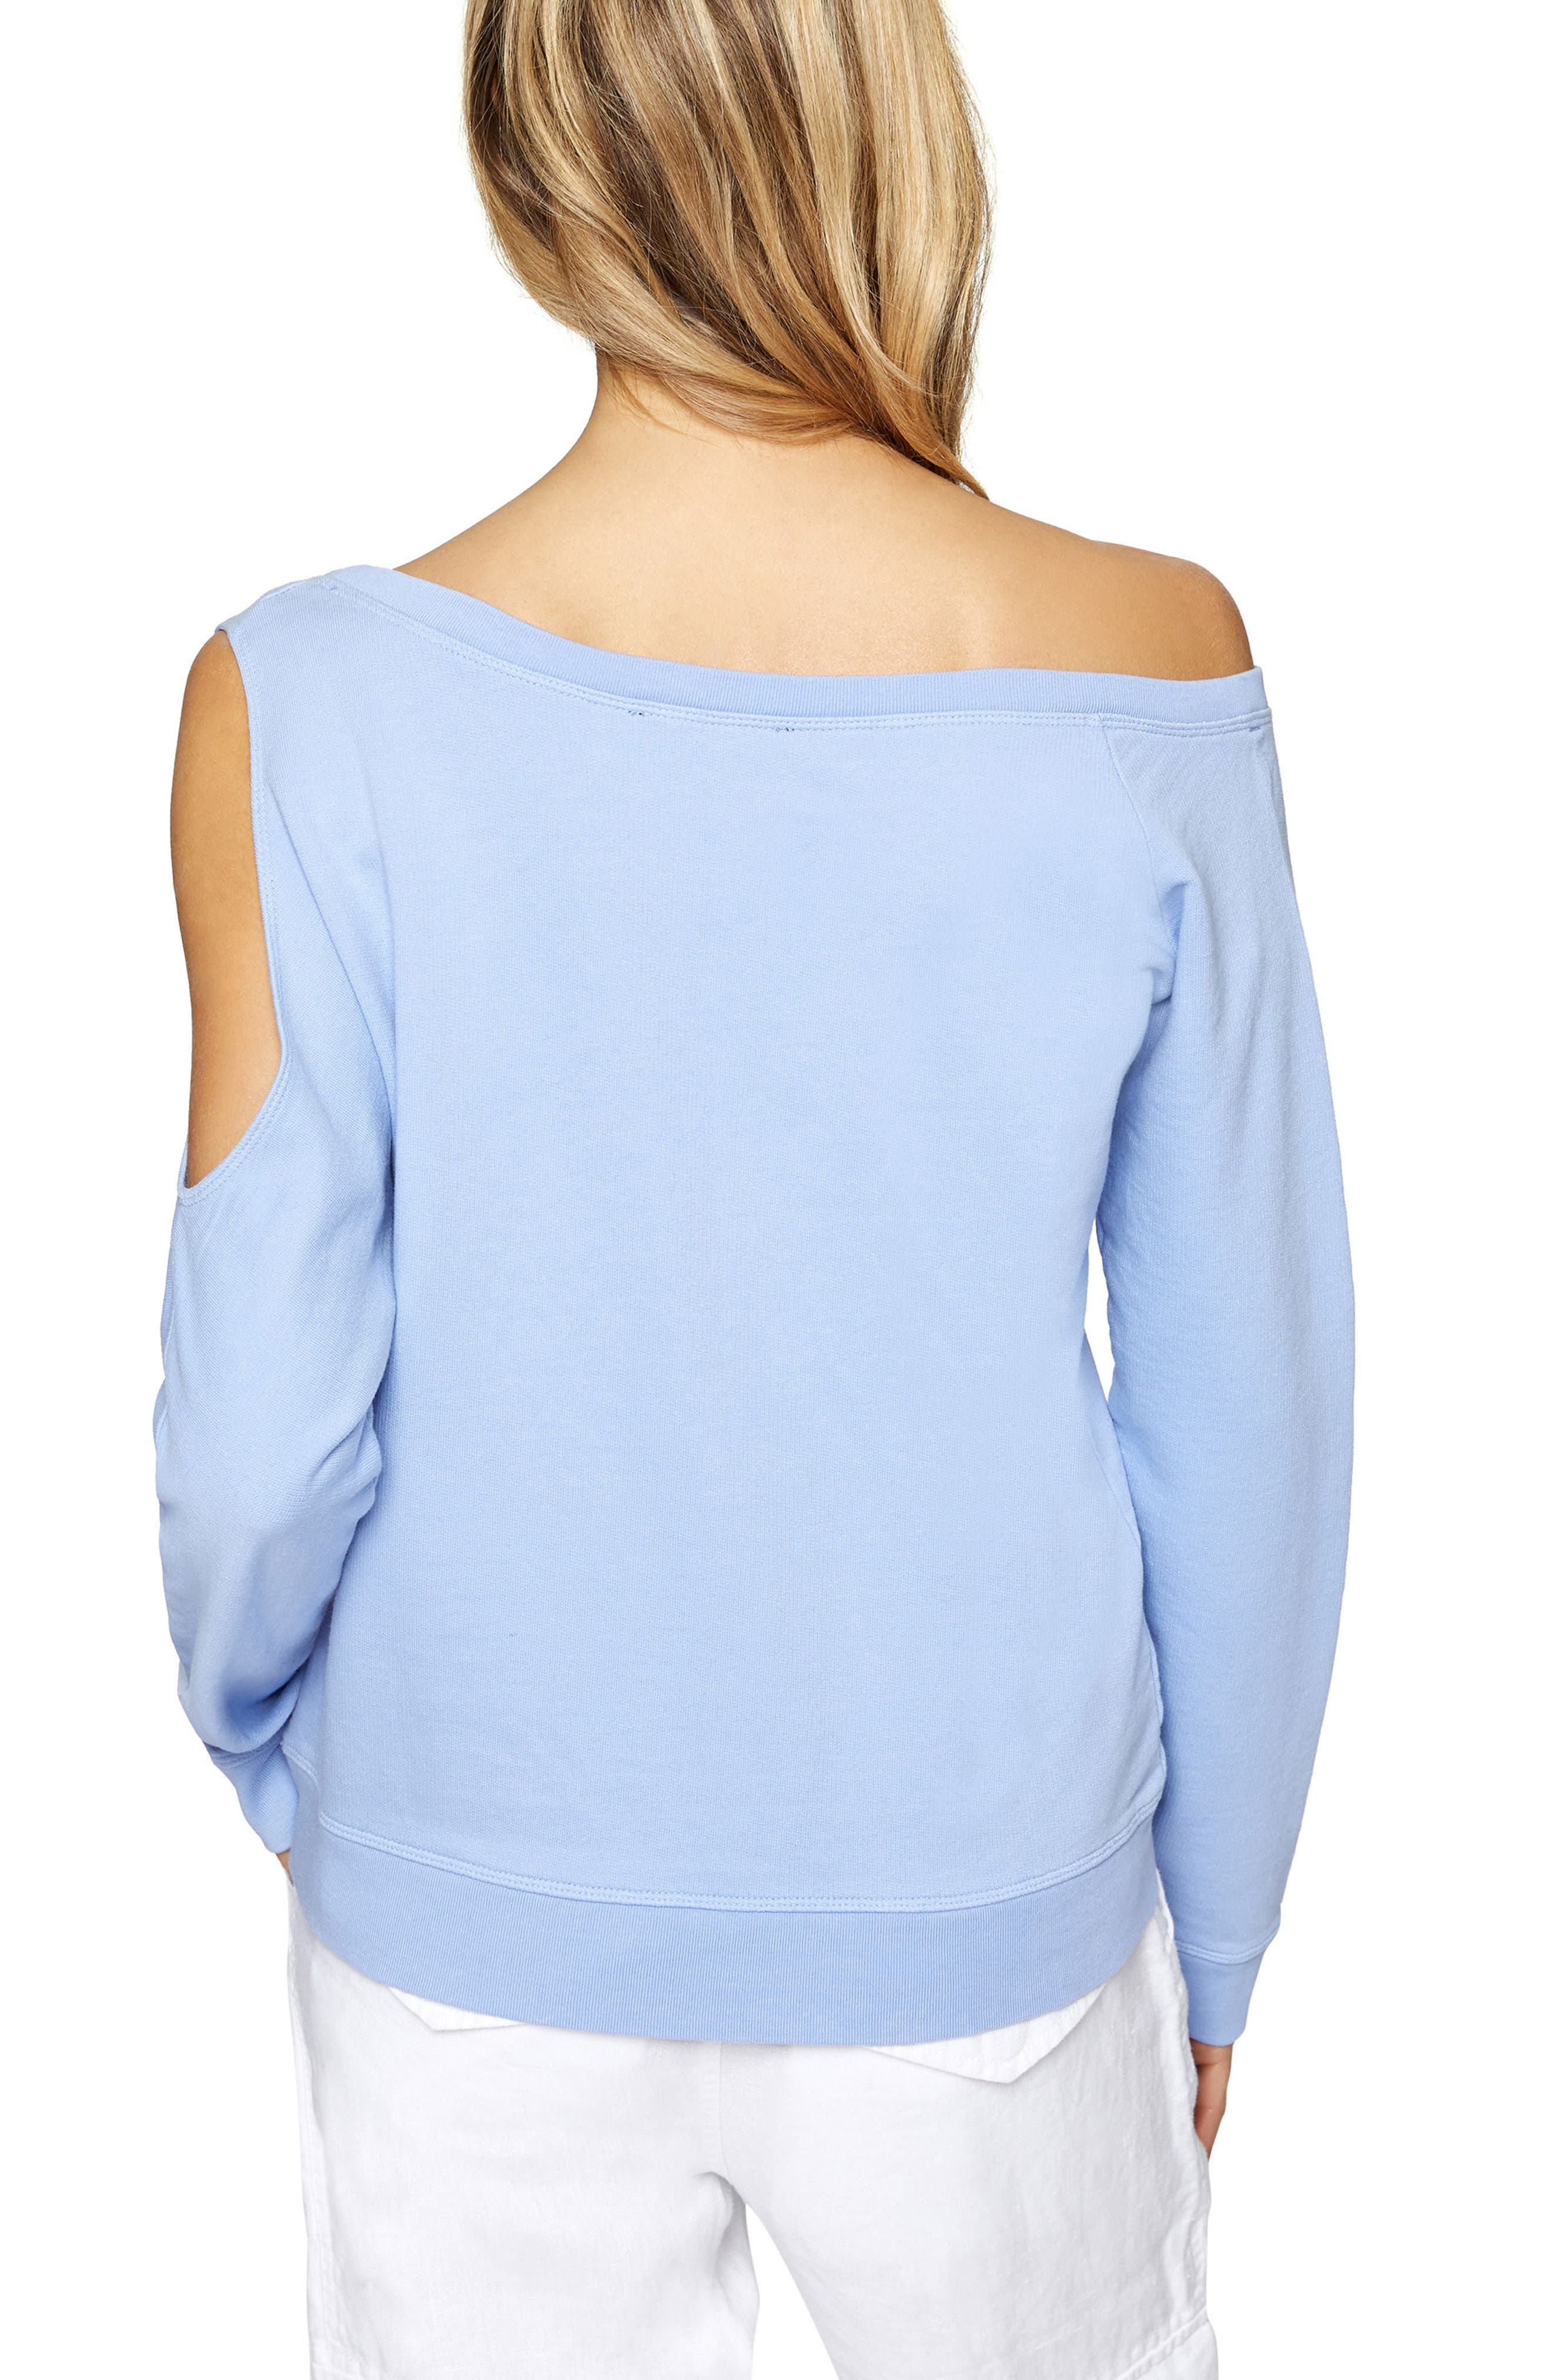 Alexi Asymmetrical Sweatshirt,                             Alternate thumbnail 4, color,